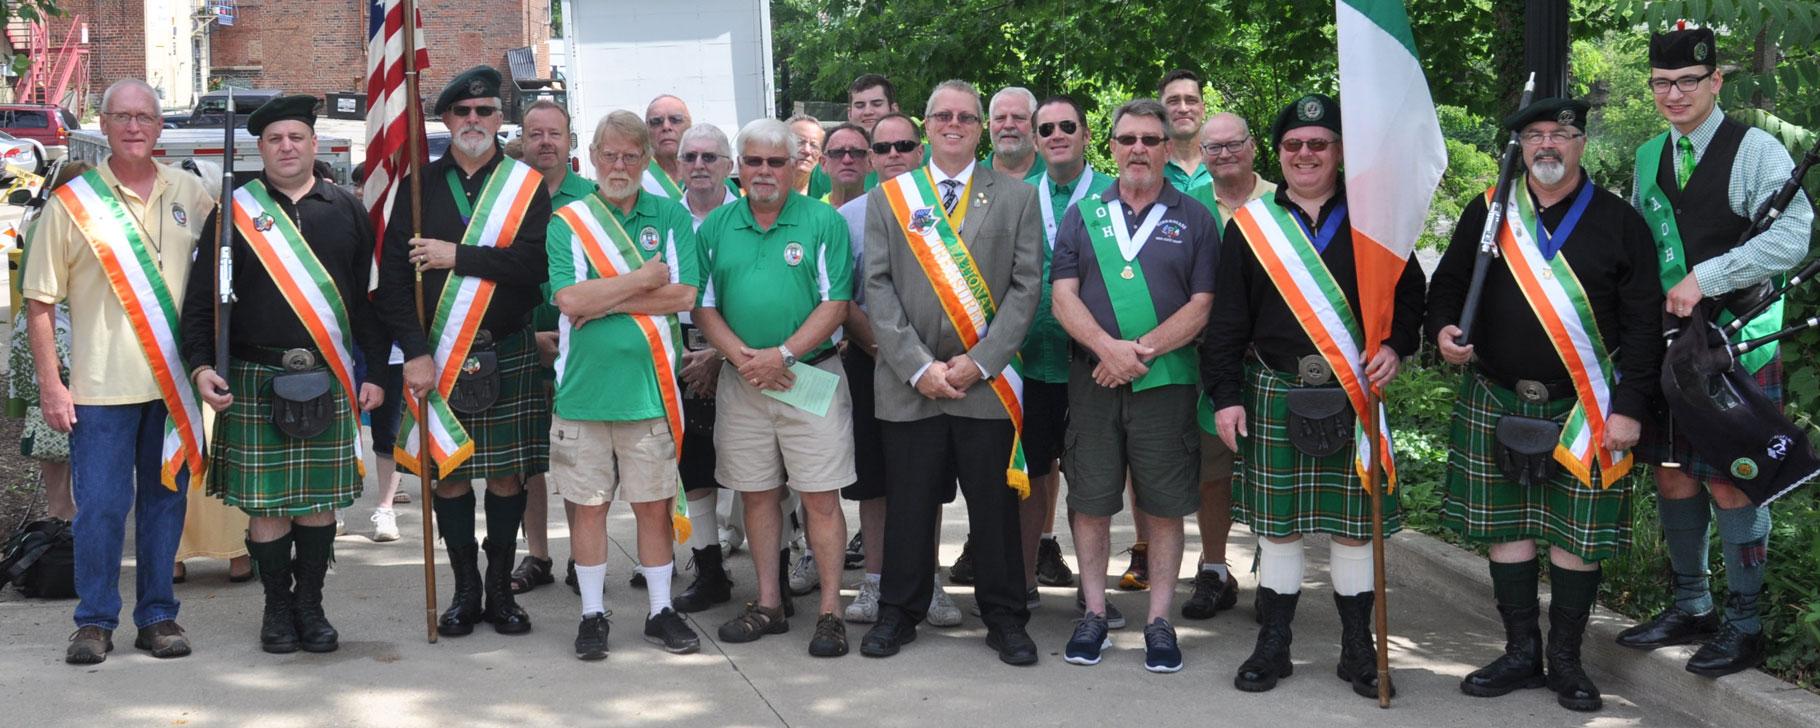 St. Brendan Division